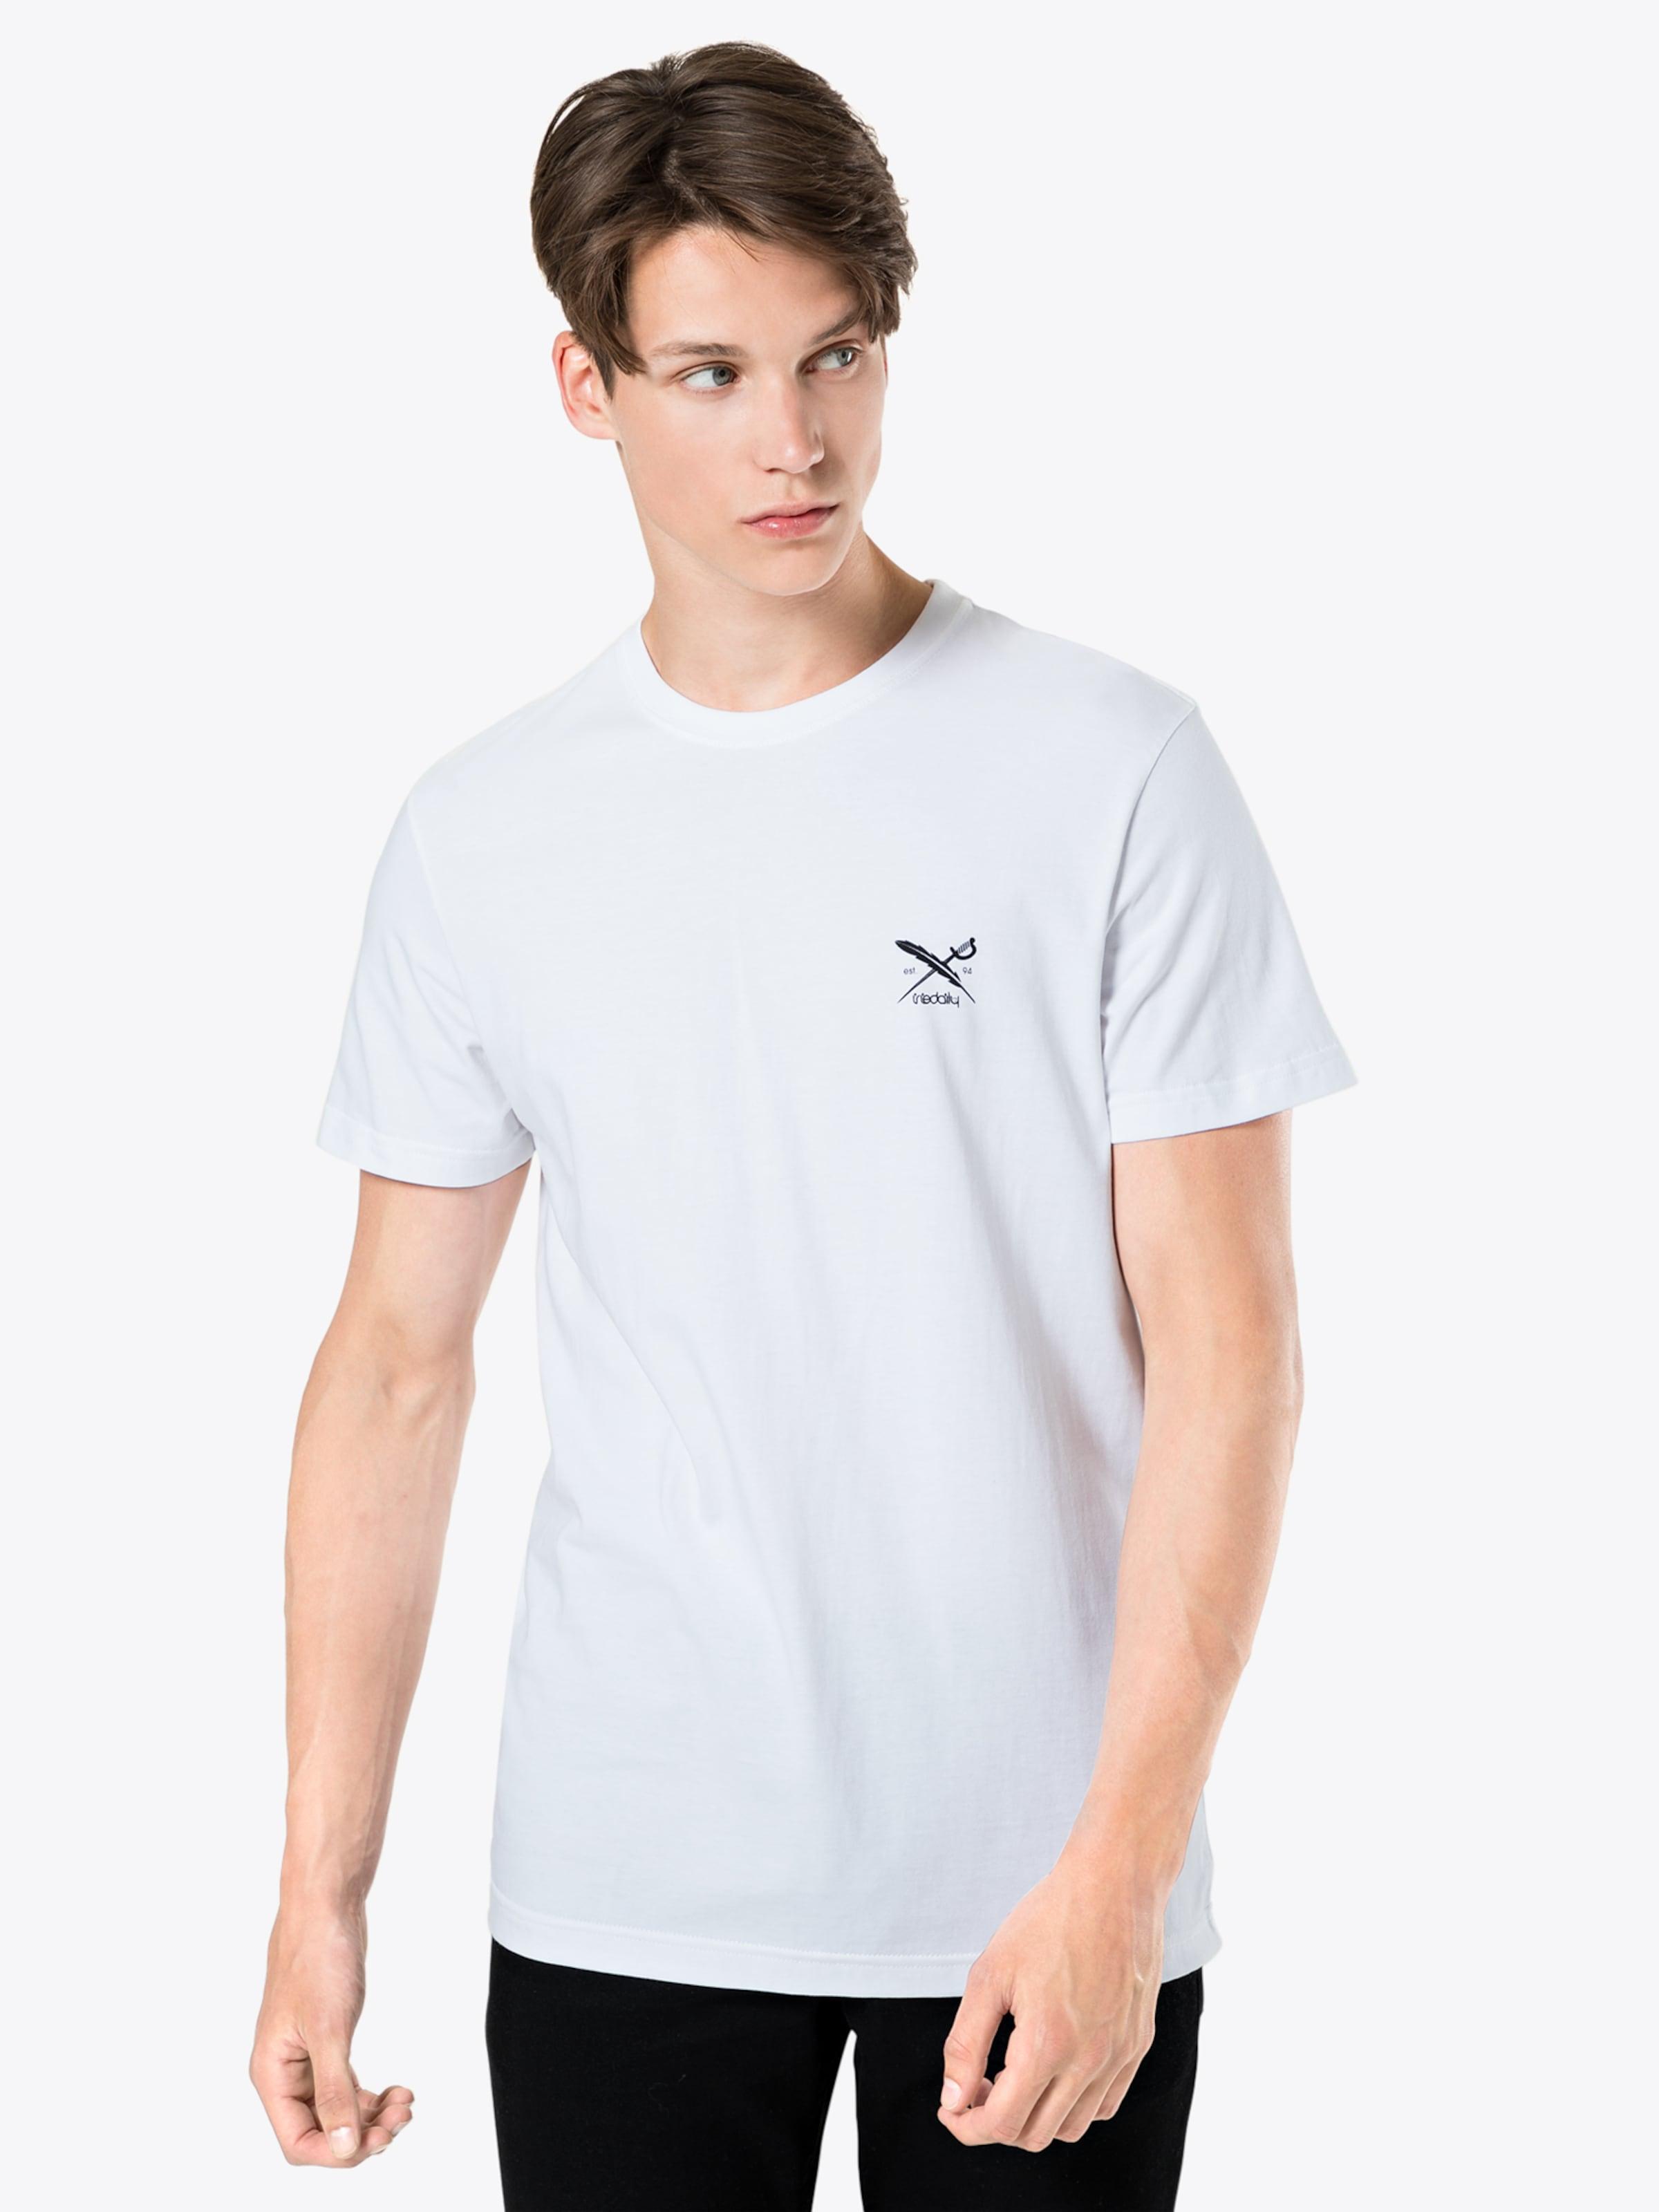 En 'chestflag shirt Tee' Gris Chiné Iriedaily T QhrdCts